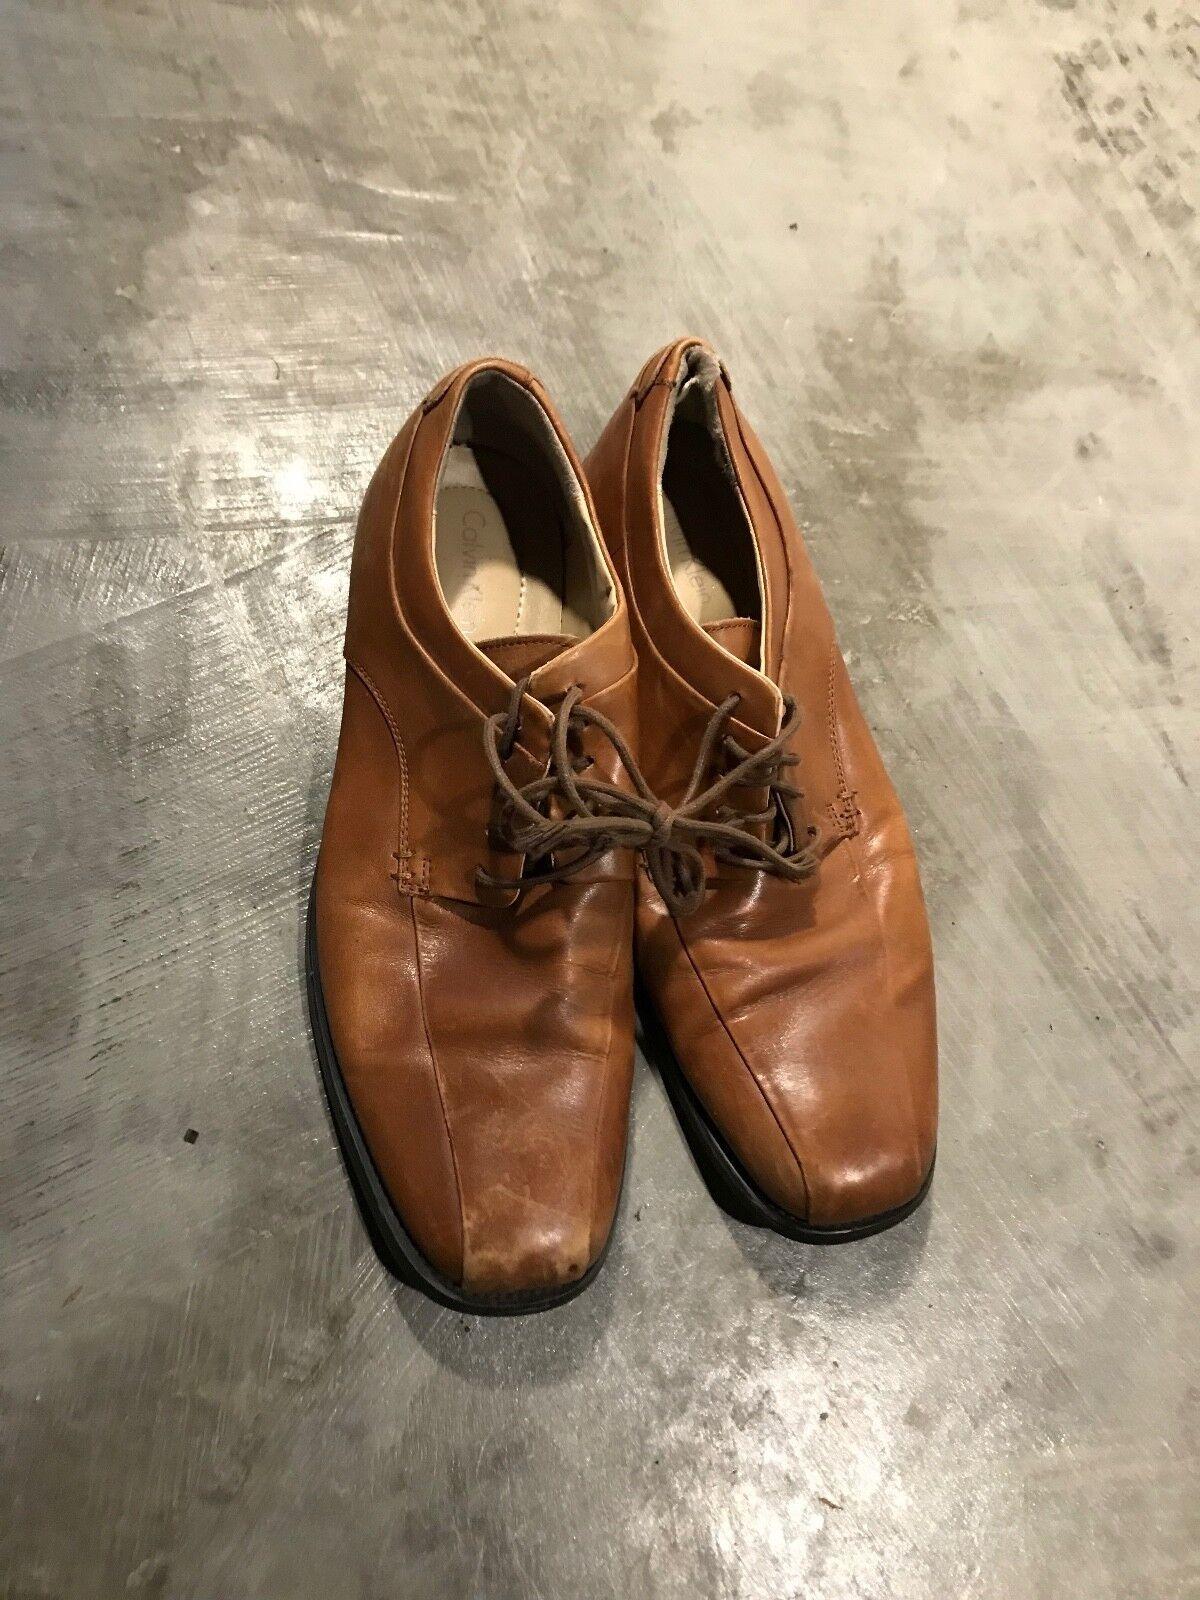 Calvin Klein Brown 10 Leather Dress Formal Shoes - SZ 10 Brown M 10M 3359c7